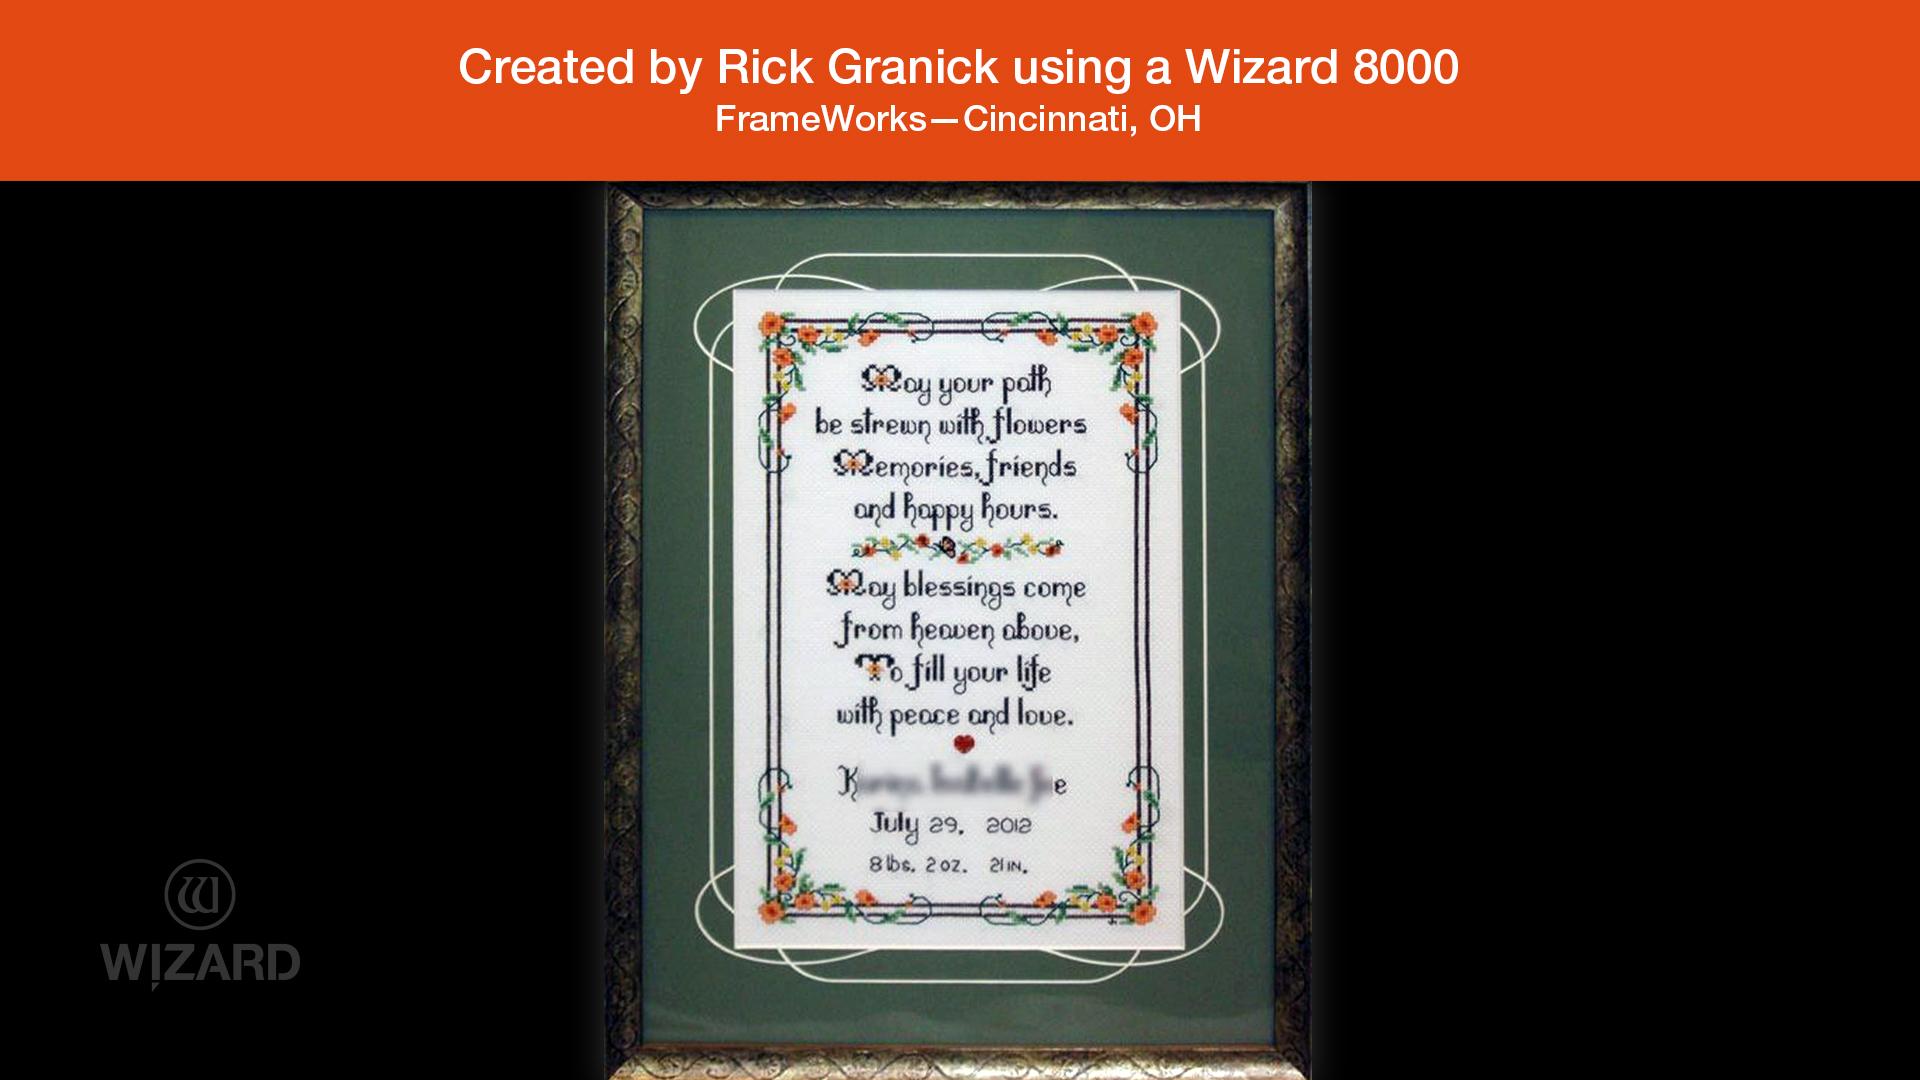 rick-granick-2.jpg